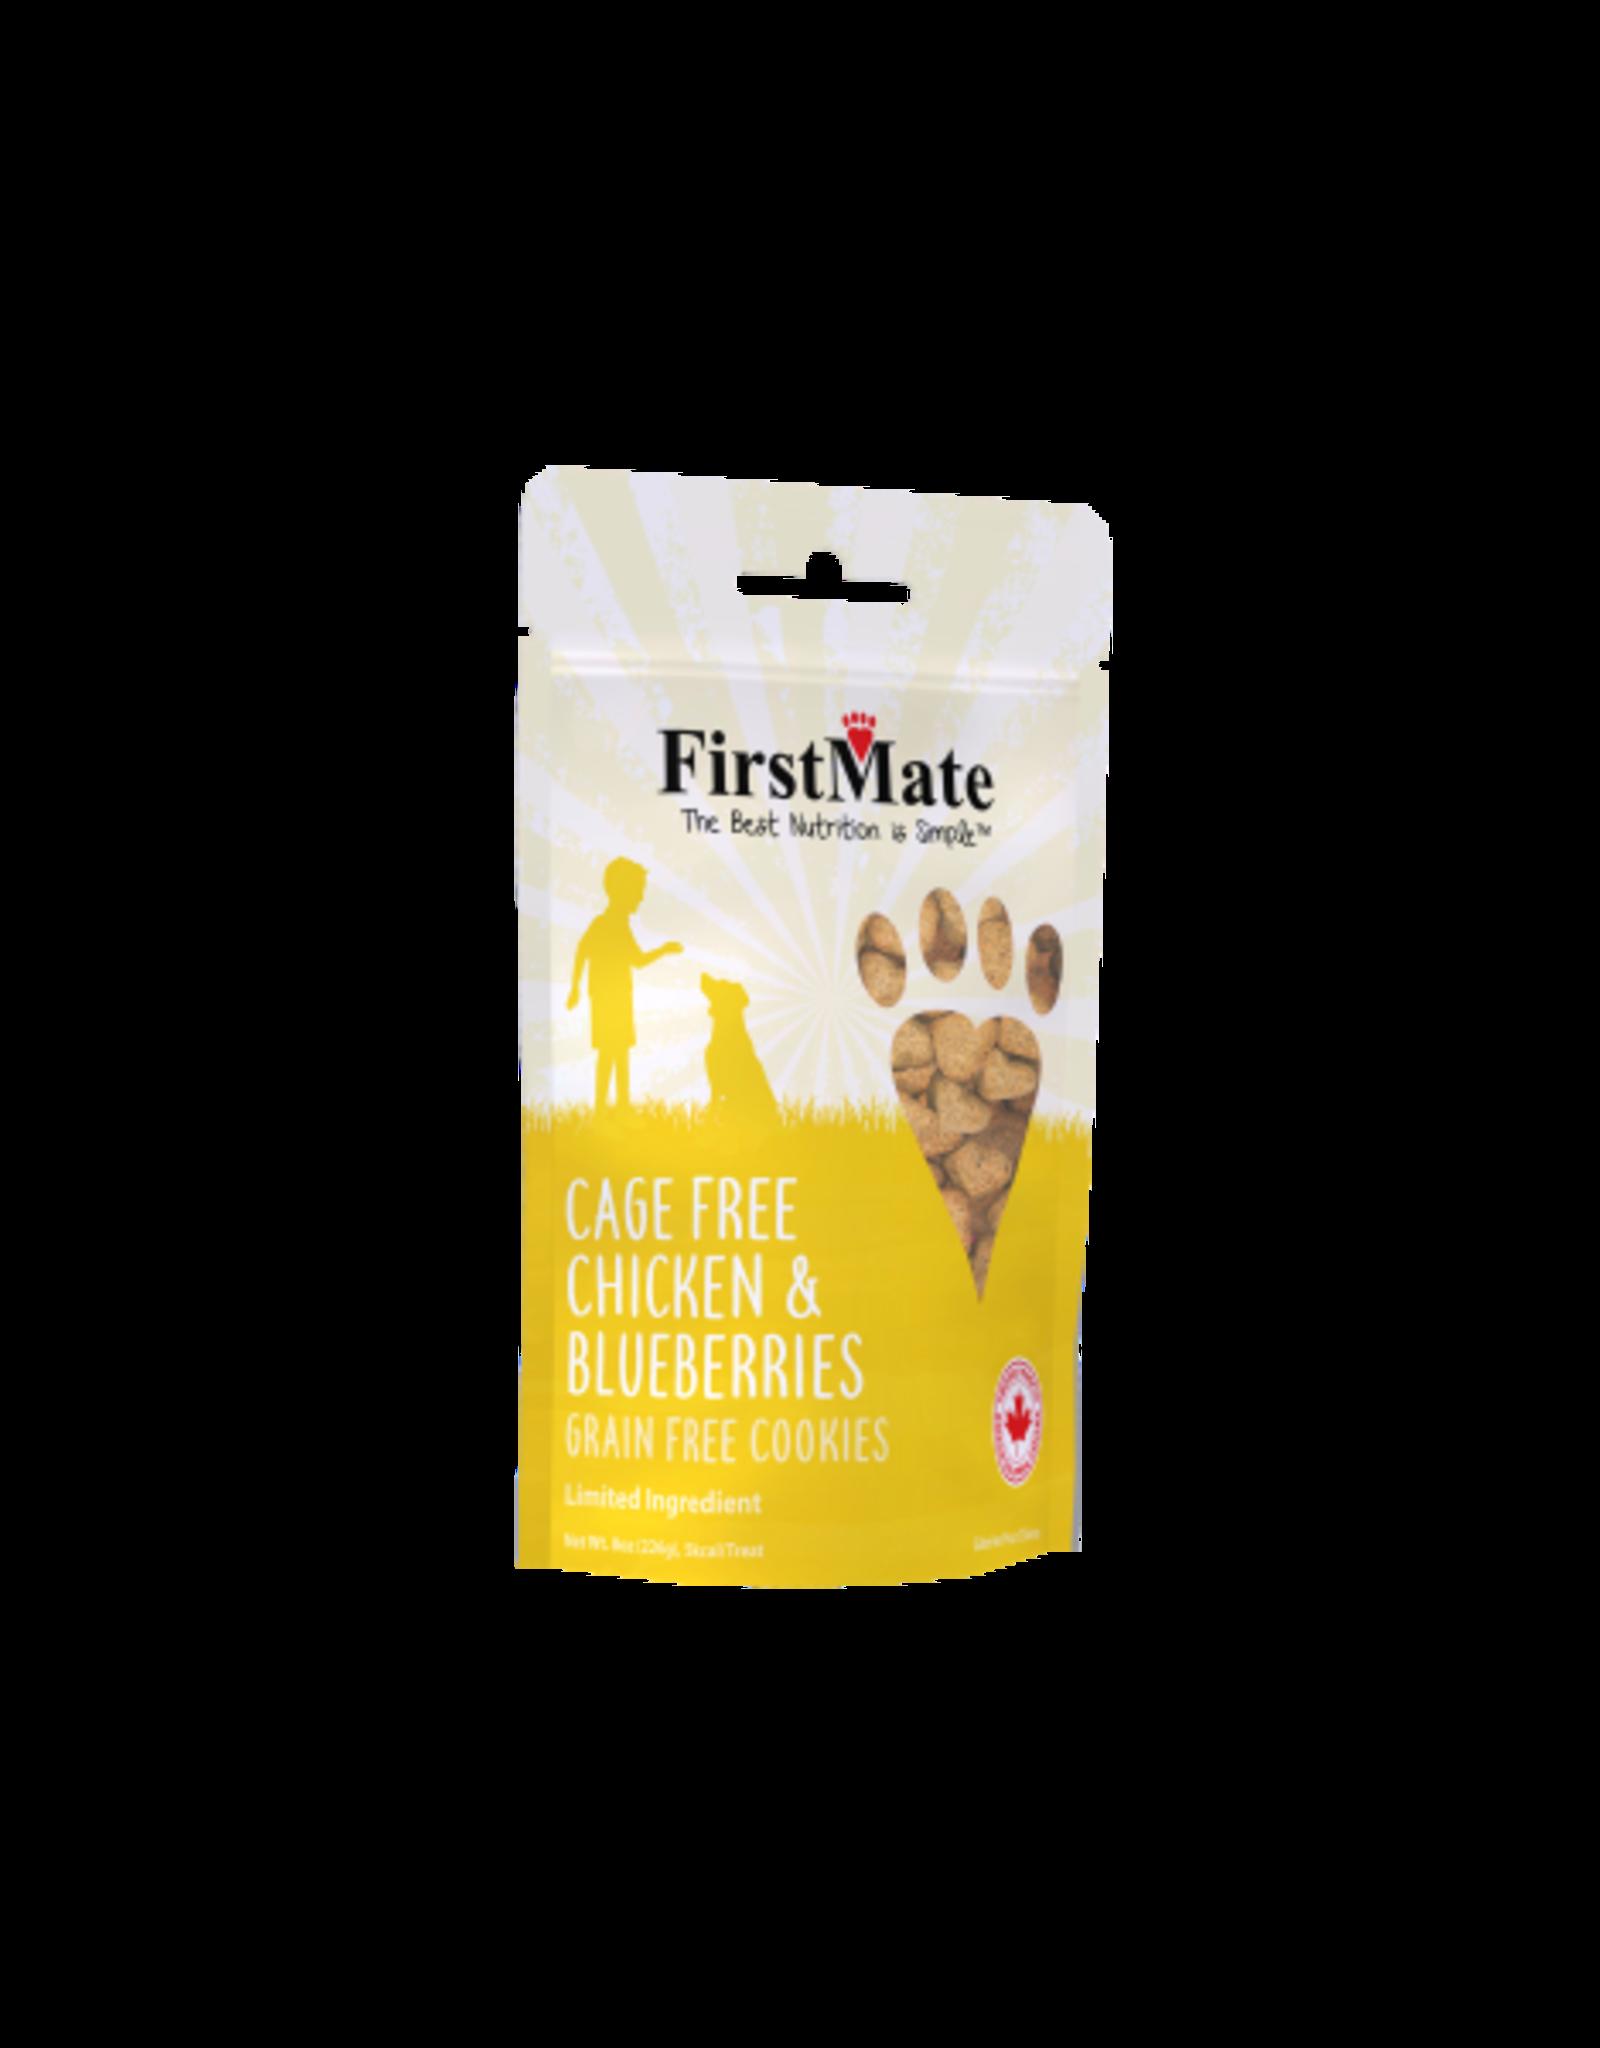 First Mate FirstMate Dog LID GF Chicken & Blueberries Cookies 8 oz